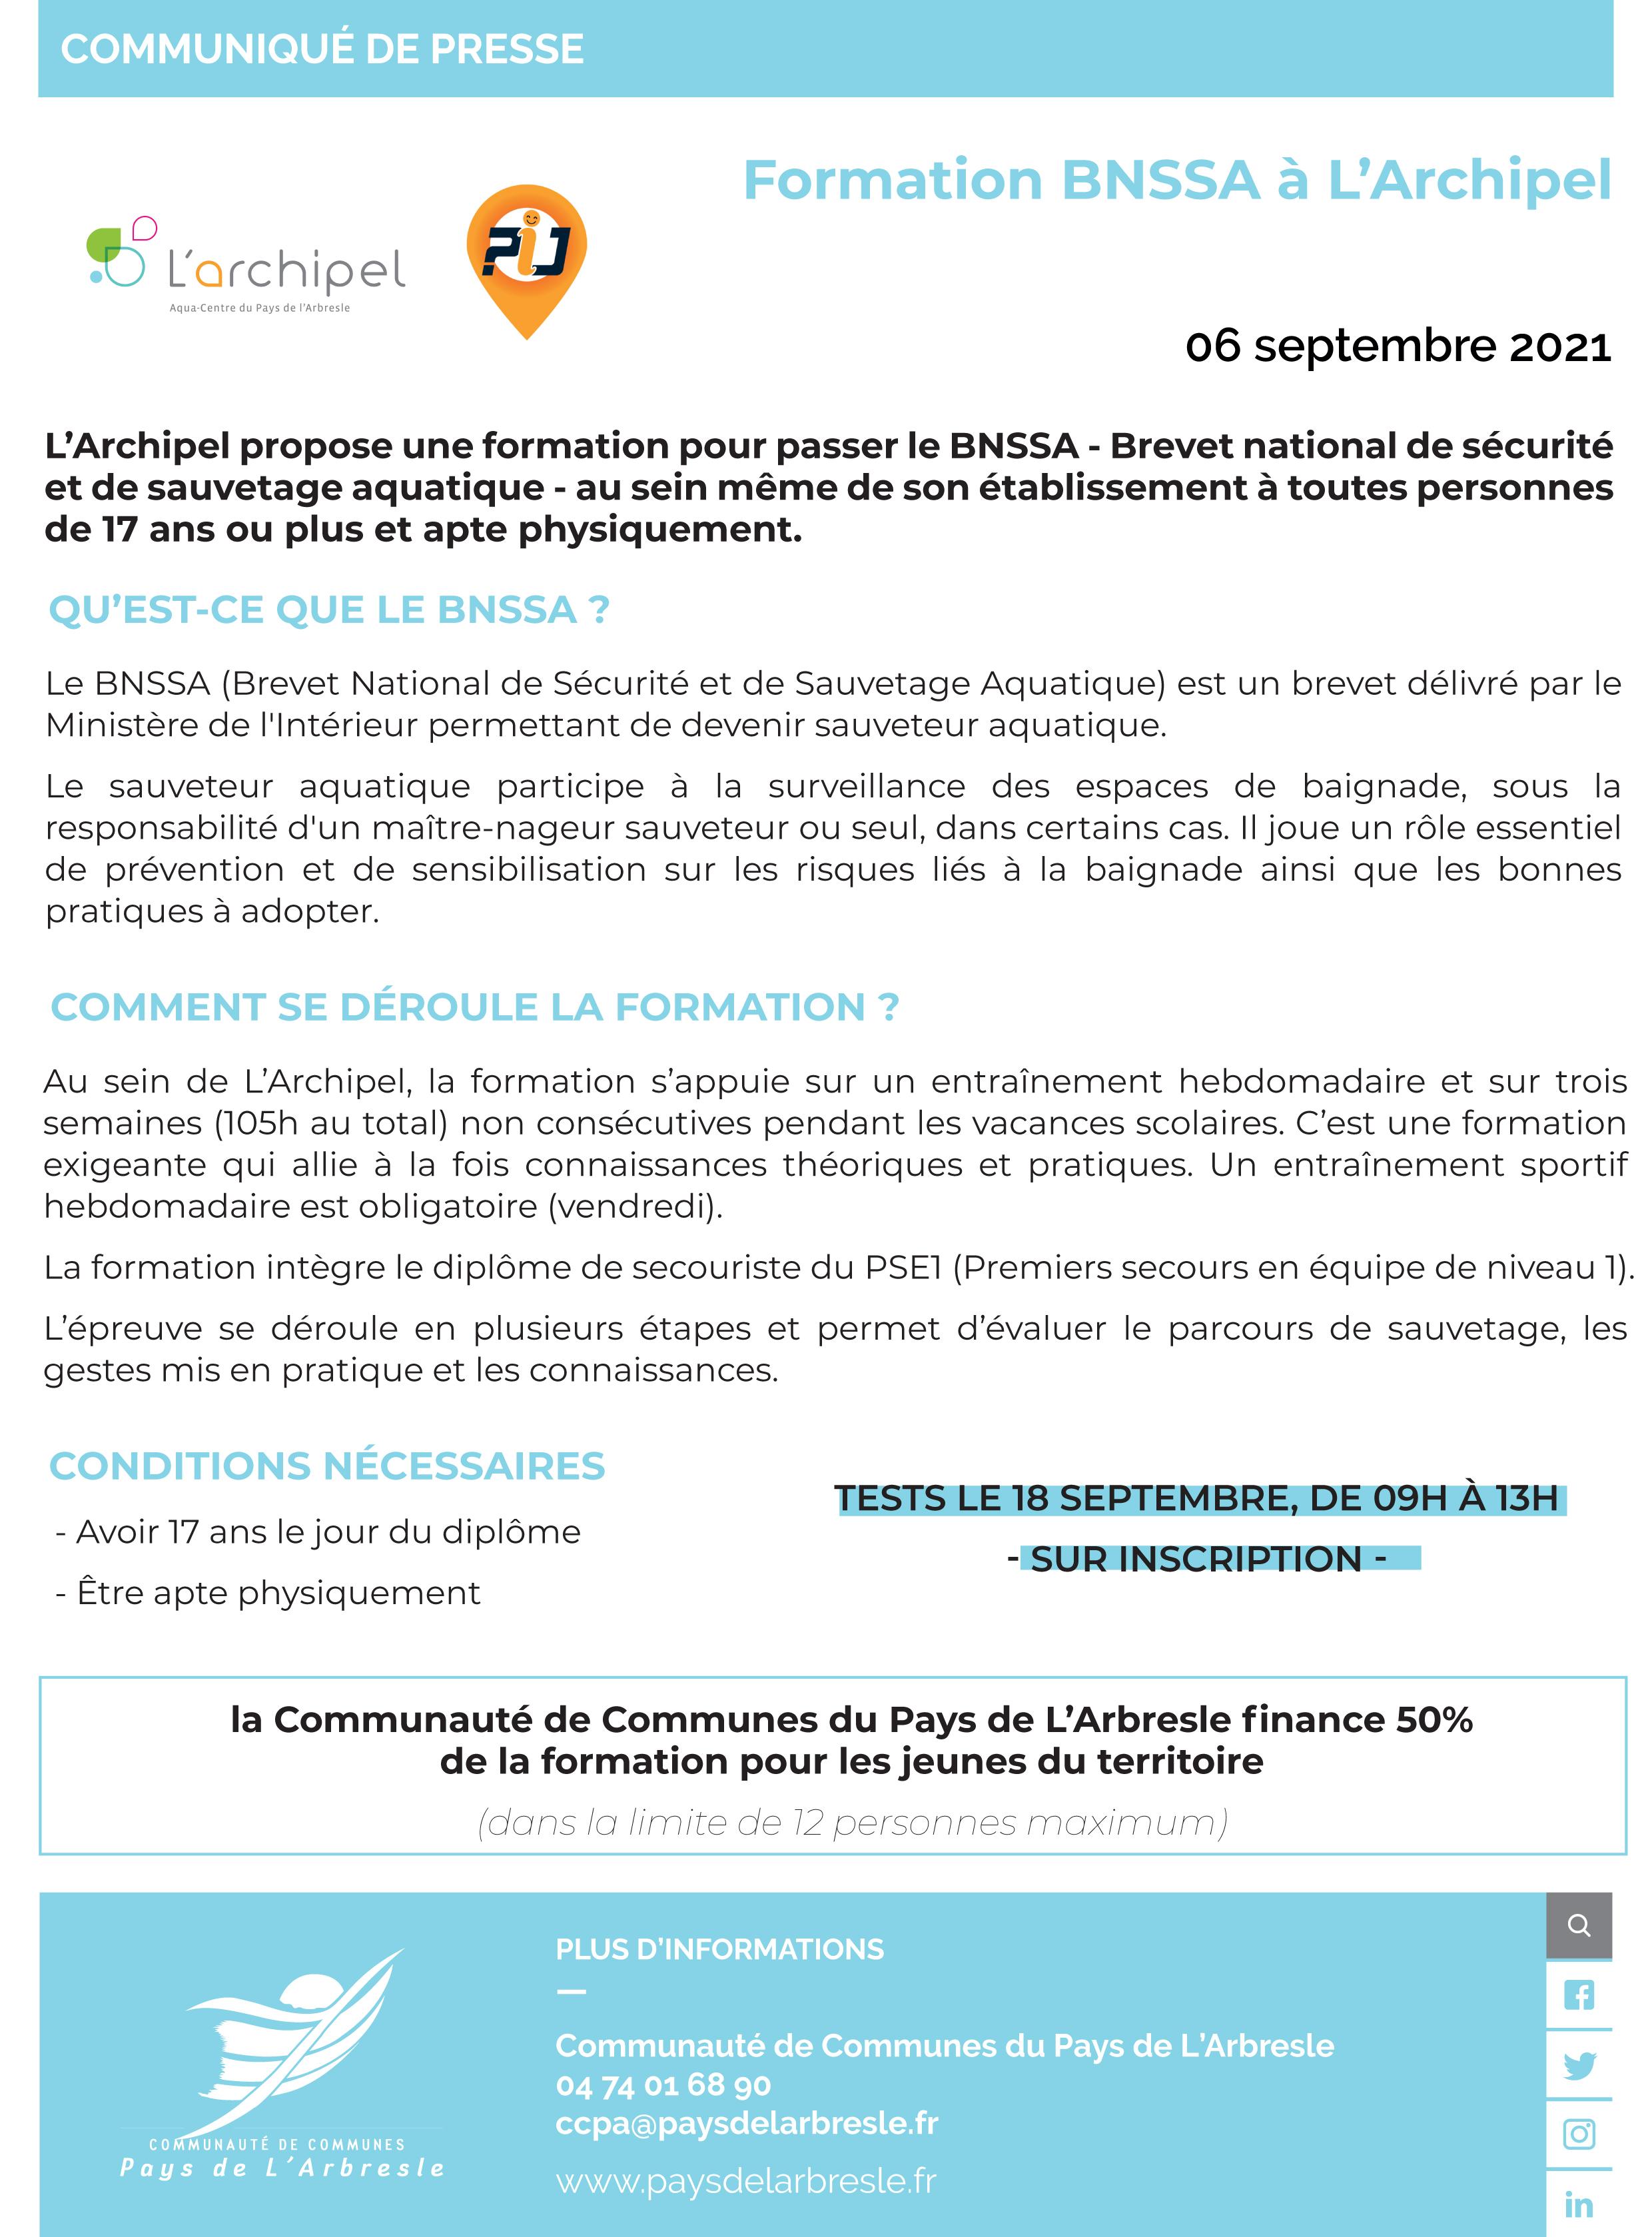 Communique-presse_CCPA_BNSSA.JPG